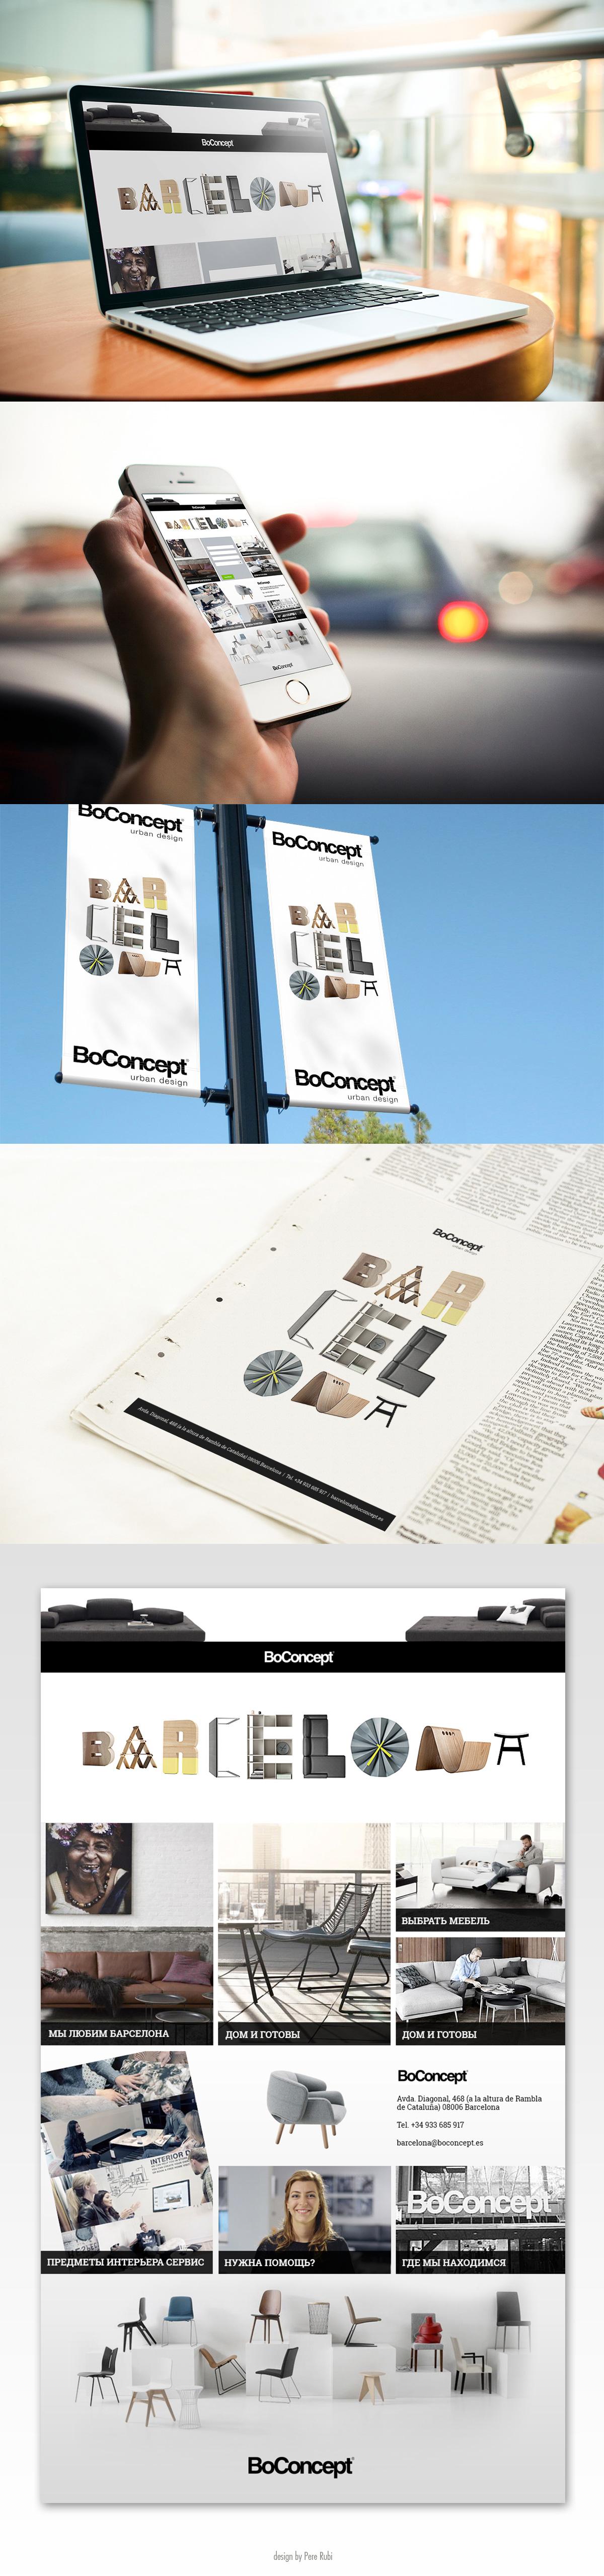 BoConcept Barcelona